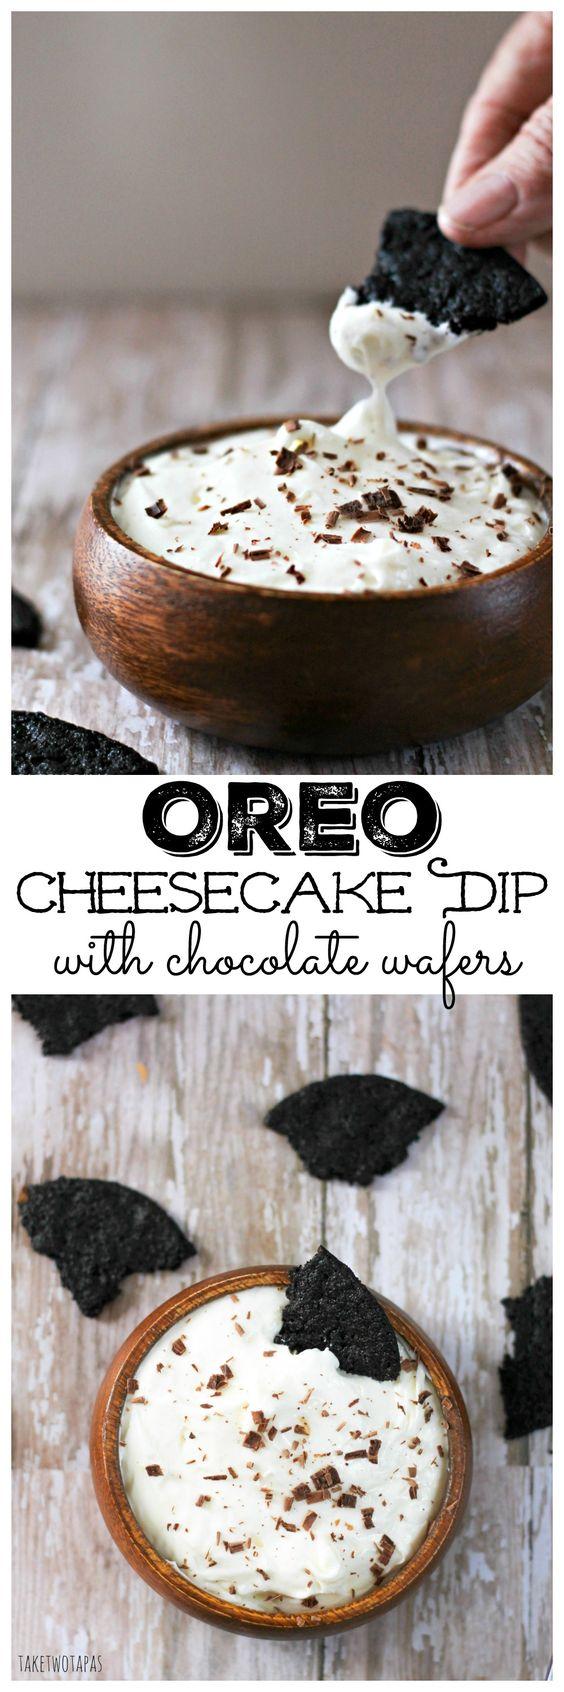 oreo cheesecake dip.jpg